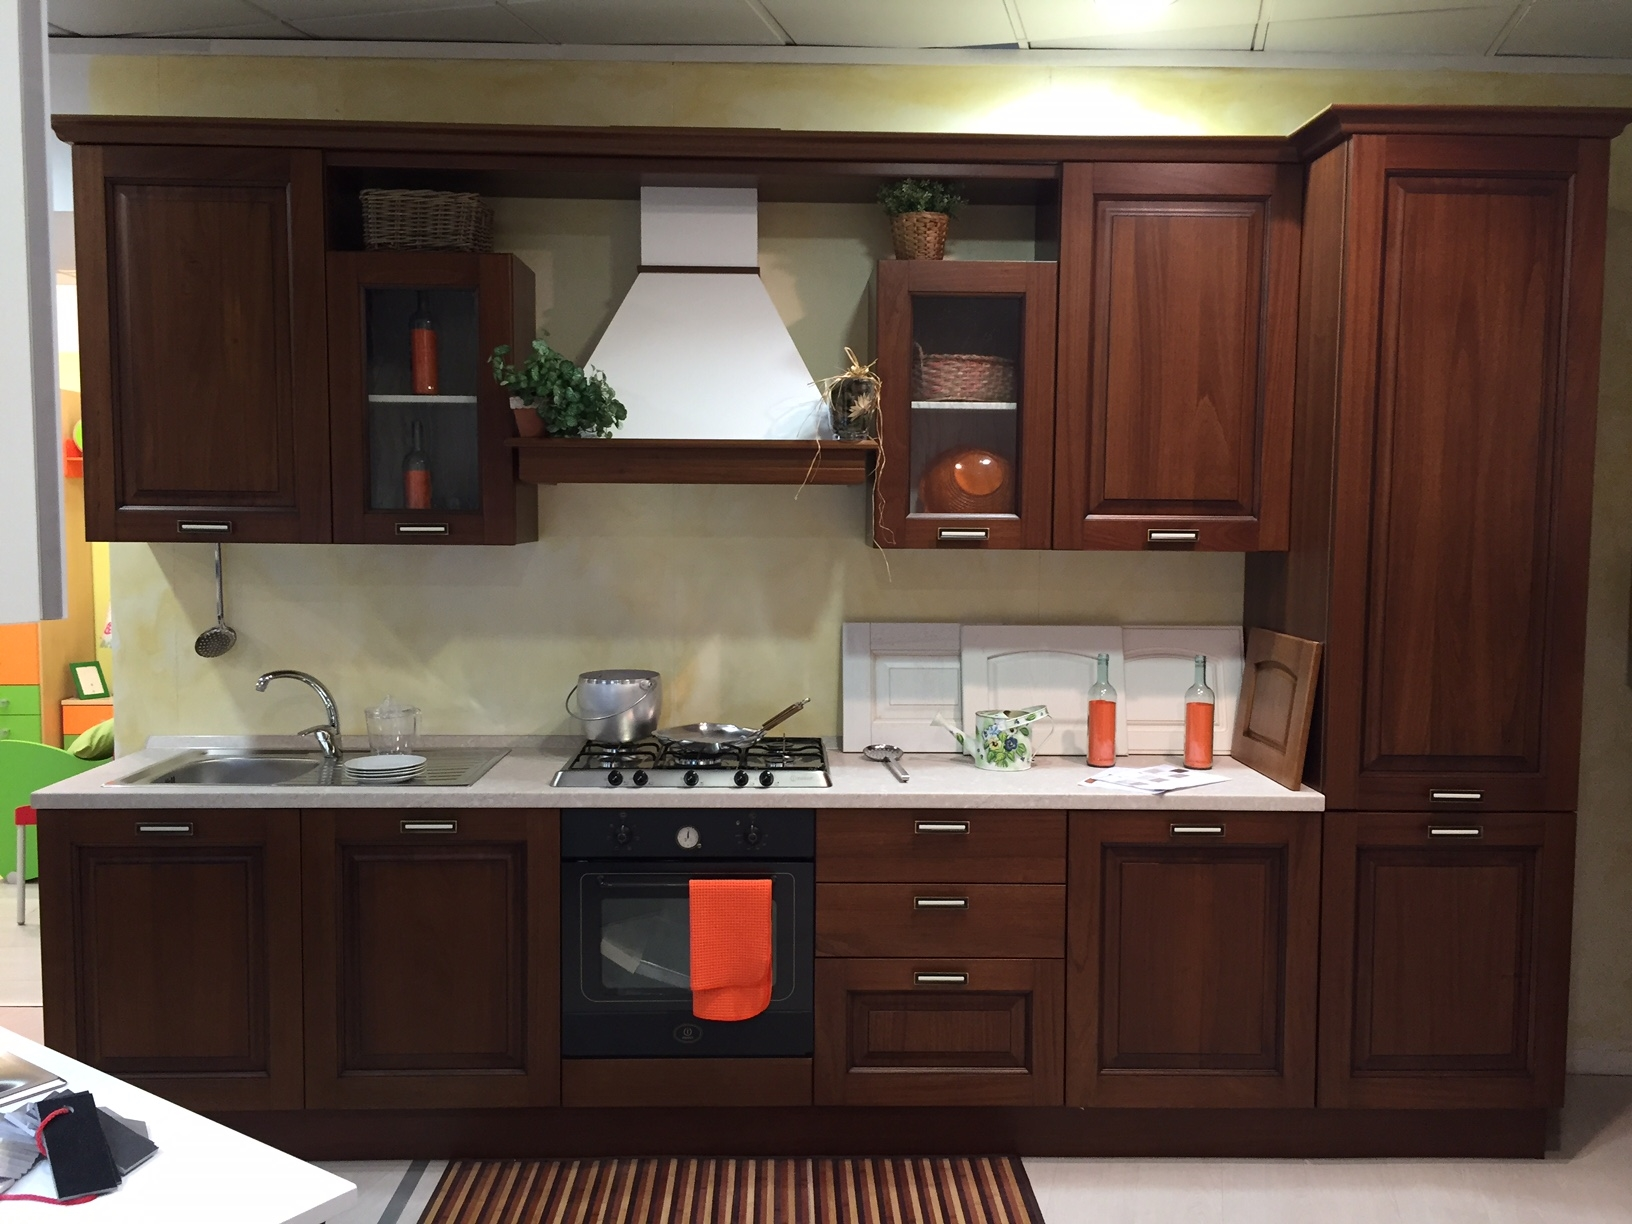 Creo kitchens cucina oprah classico legno noce l 360 cm - Cucine color avorio ...